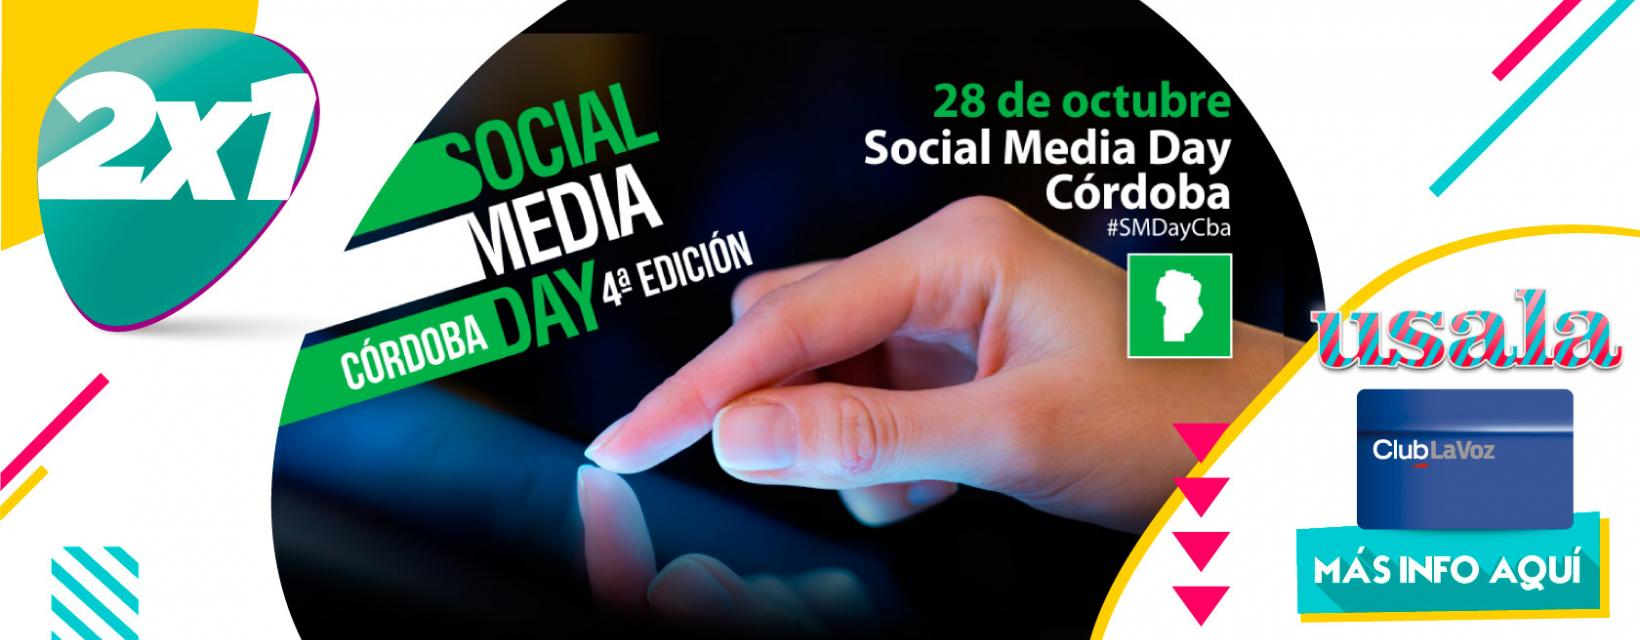 Social Media Day 2016 BANNER